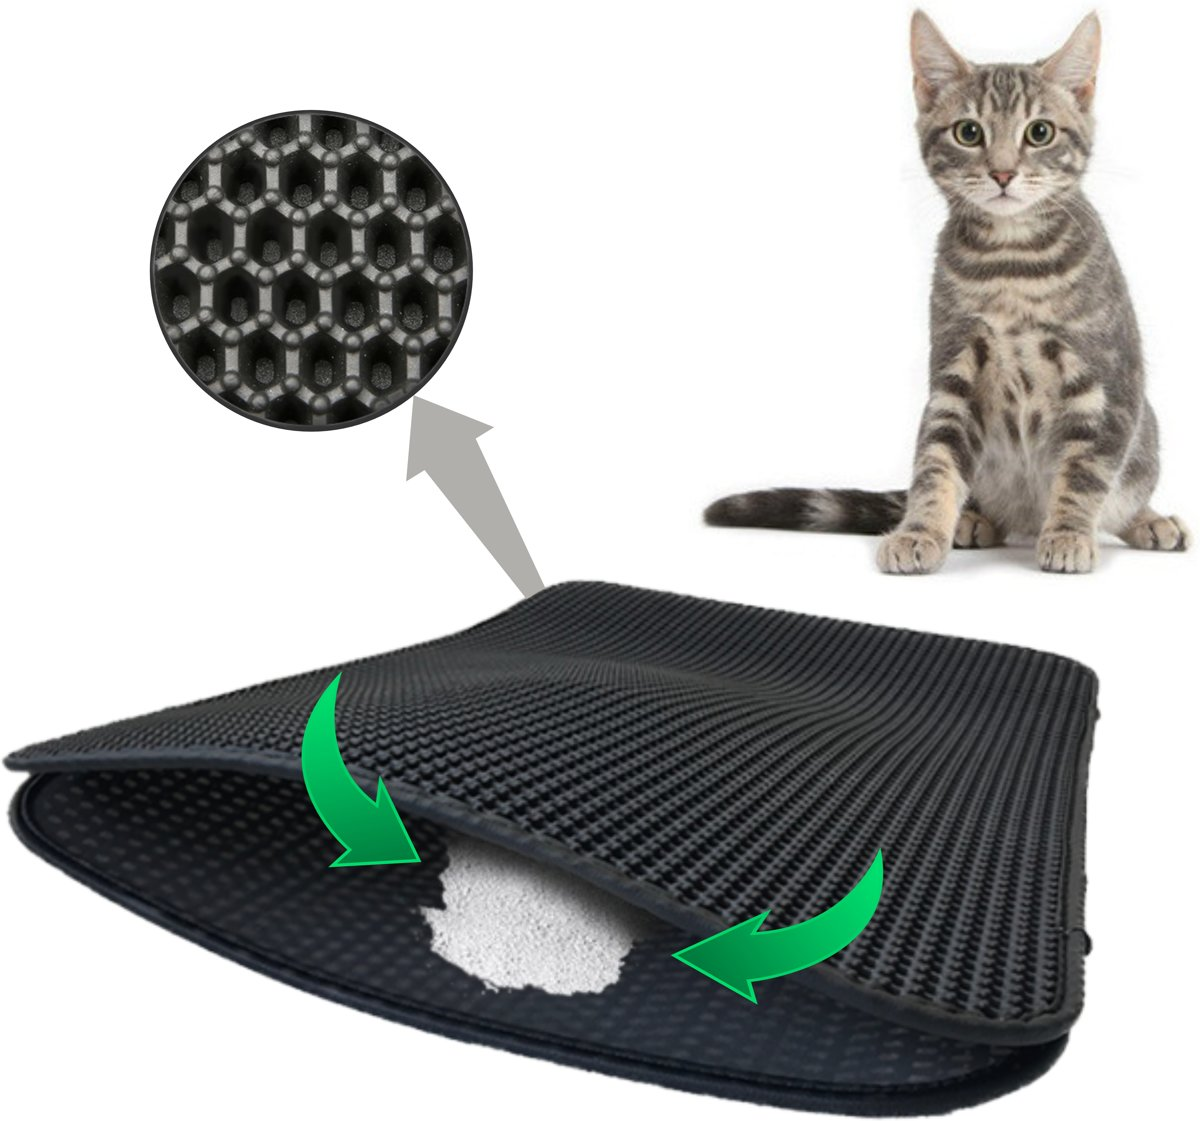 Kattenbakmat - Katten - Dubbele laag kattenbakvulling - Mat trapper - Opvang ruimte - Kattengrit opvanger - Honingraat - waterdicht - Ademend - Zwart - Leren rand -Maat 40 x 50 - Eco-friendly kopen